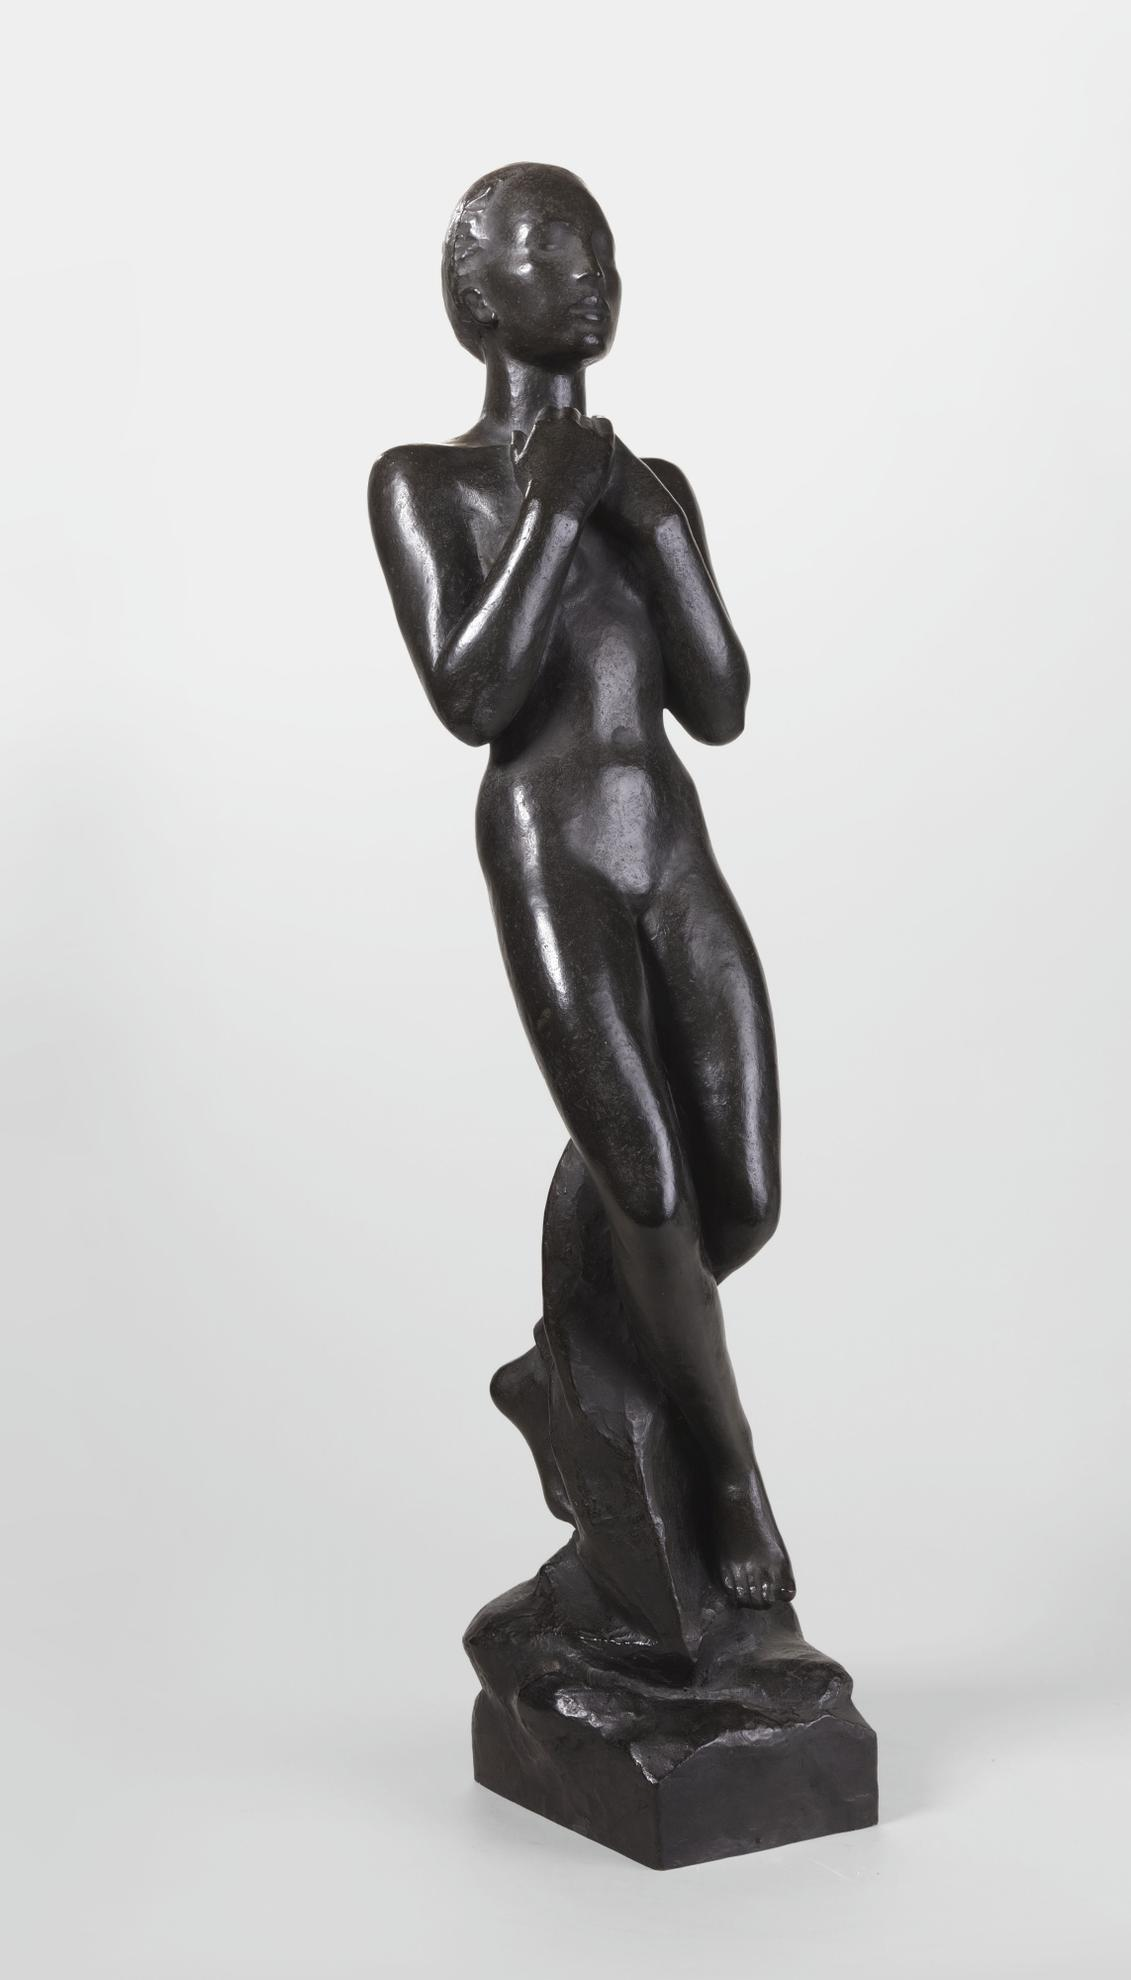 Georg Kolbe-Auferstehung (Resurrection)-1920